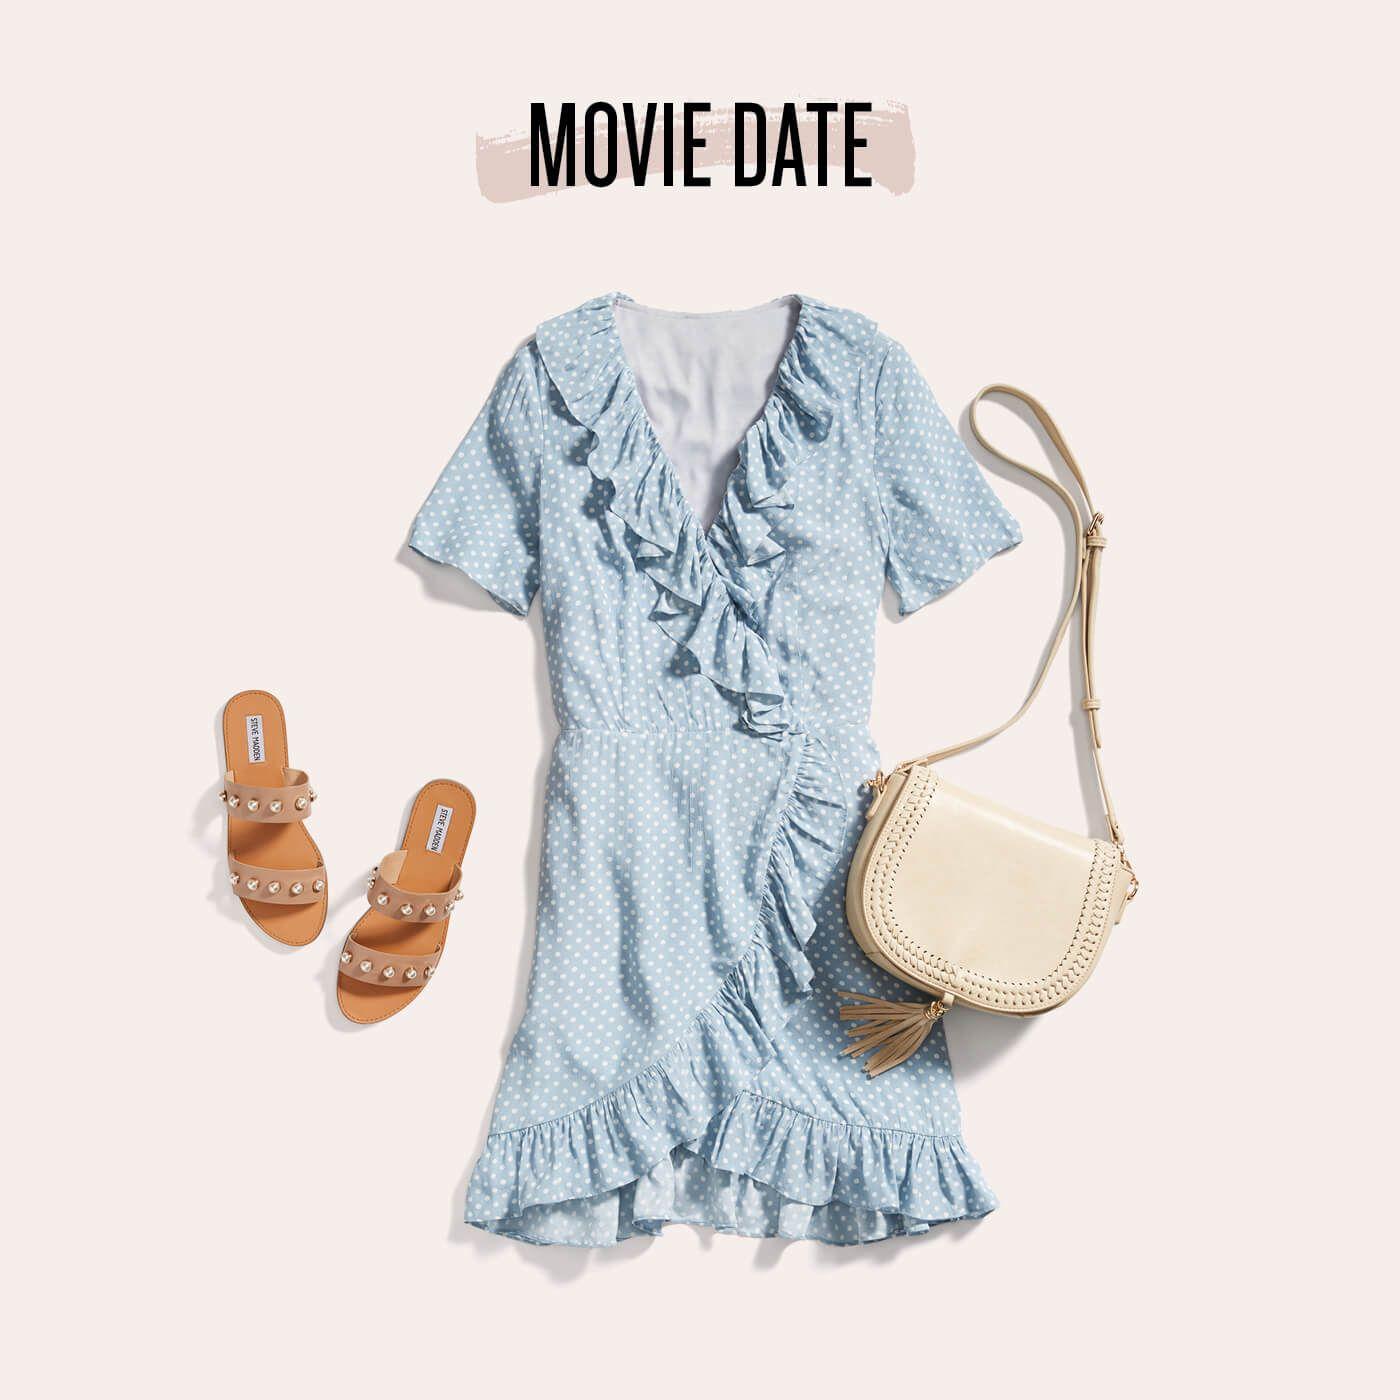 Hot summer night outfits | Stitch Fix